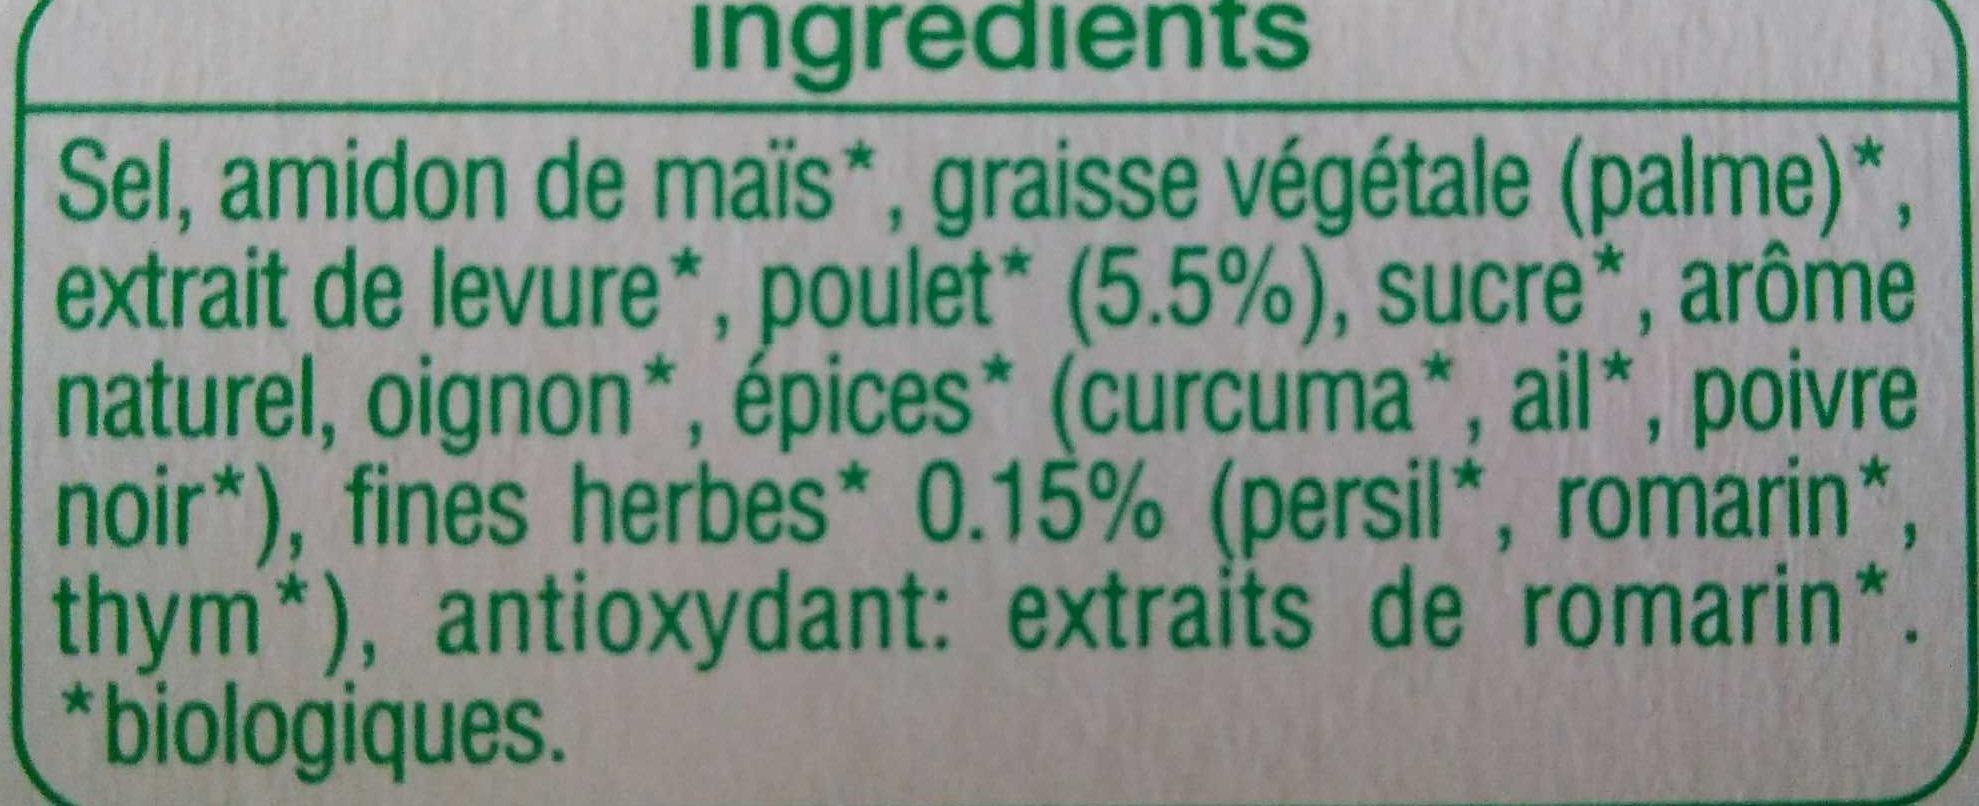 Bouillon de poulet et fines herbes - Ingrediënten